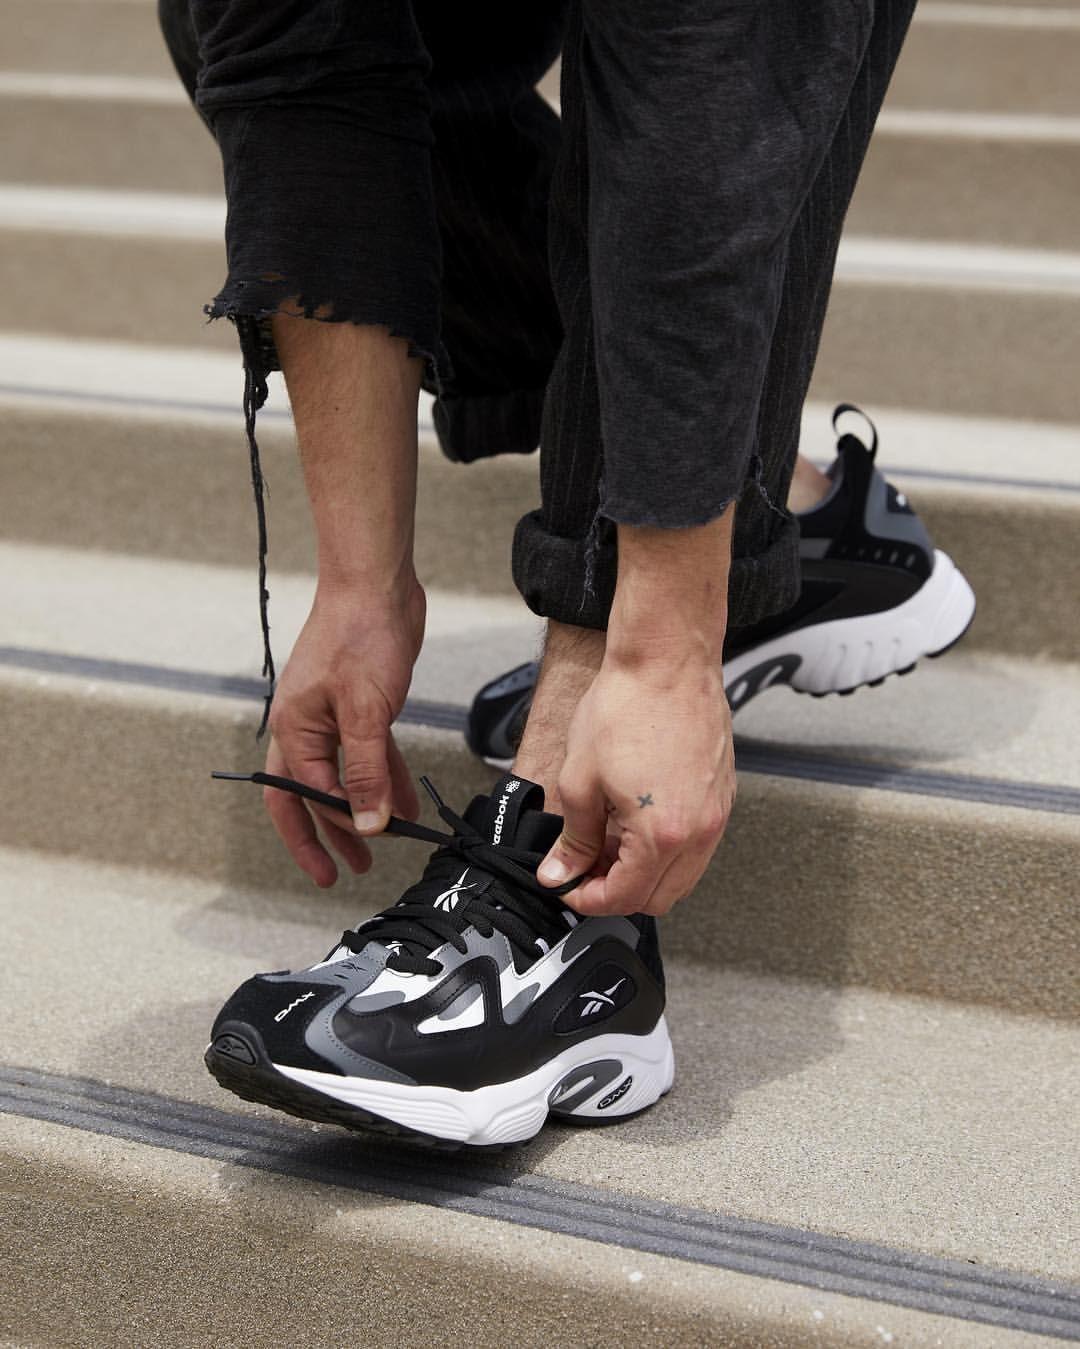 3056cdb2344 Reebok DMX 1200   Kixx in 2019   Sneakers, Sneakers nike, Reebok